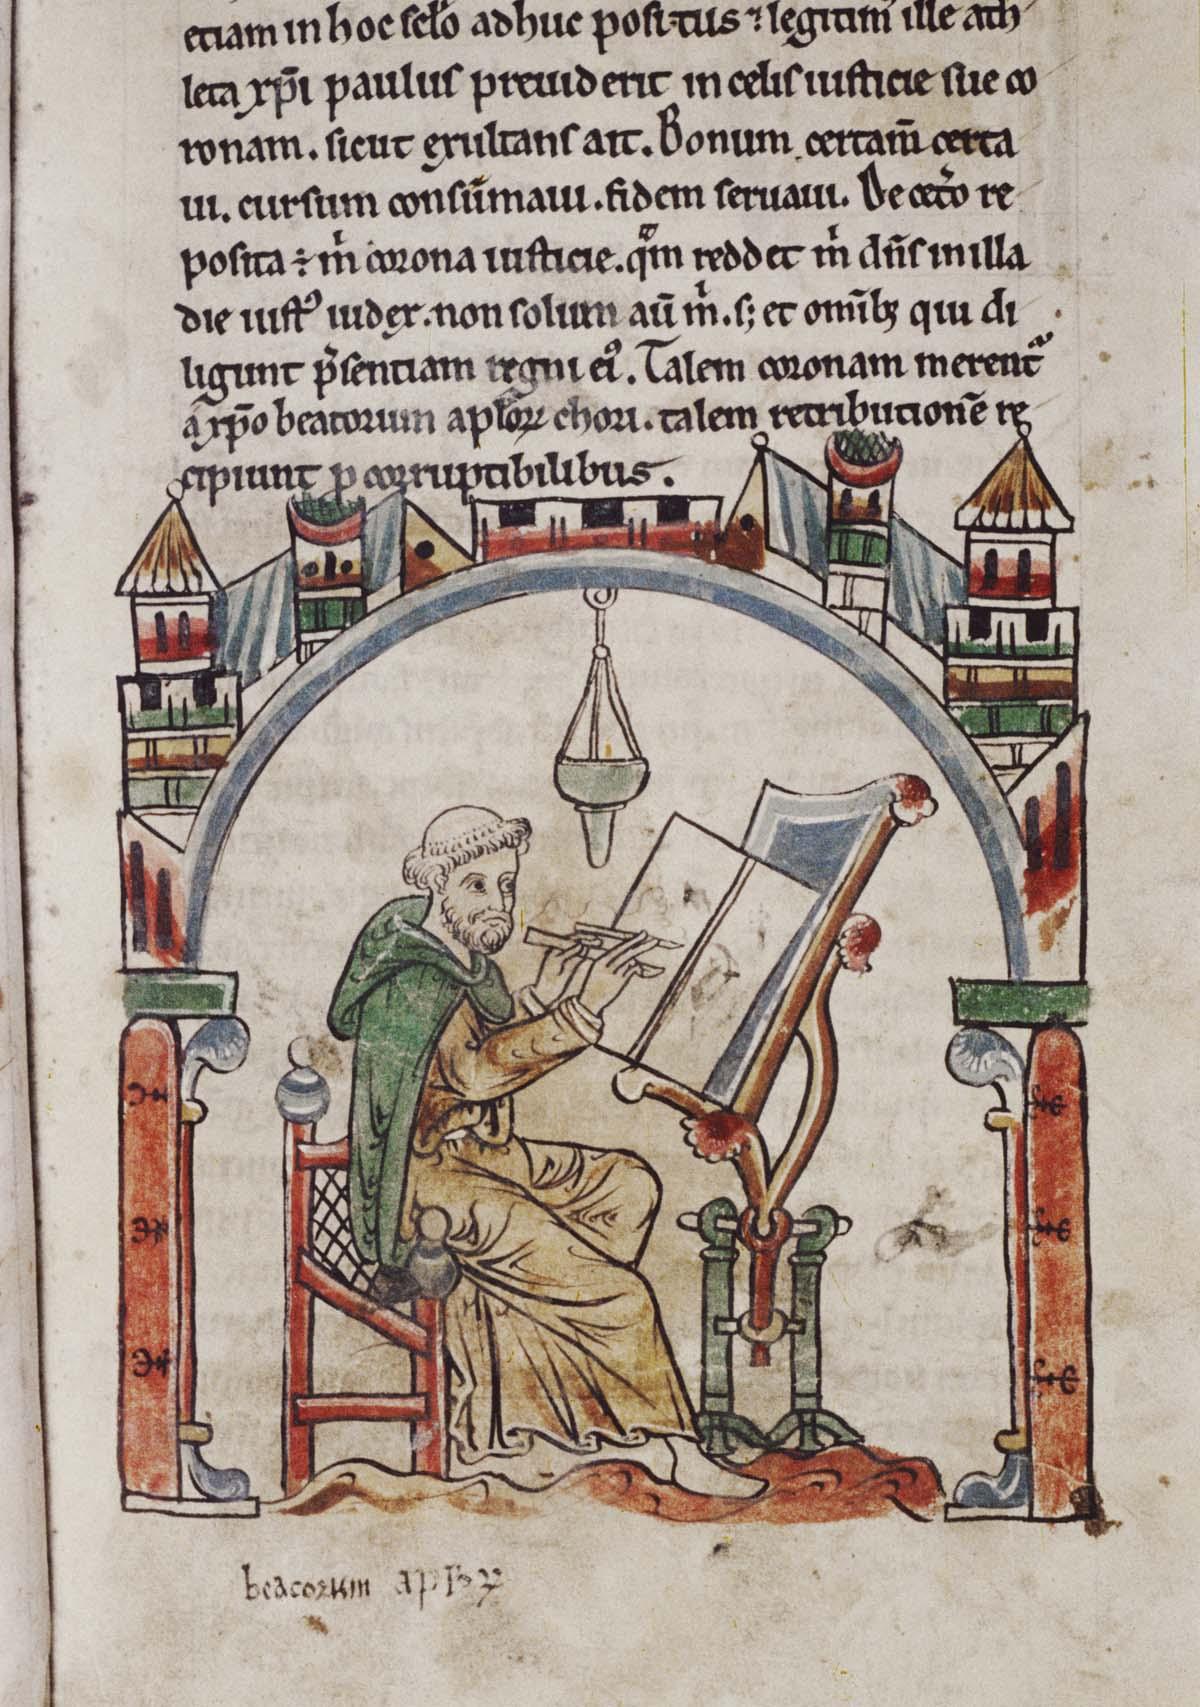 medieval illuminated illustration of a medieval scribe